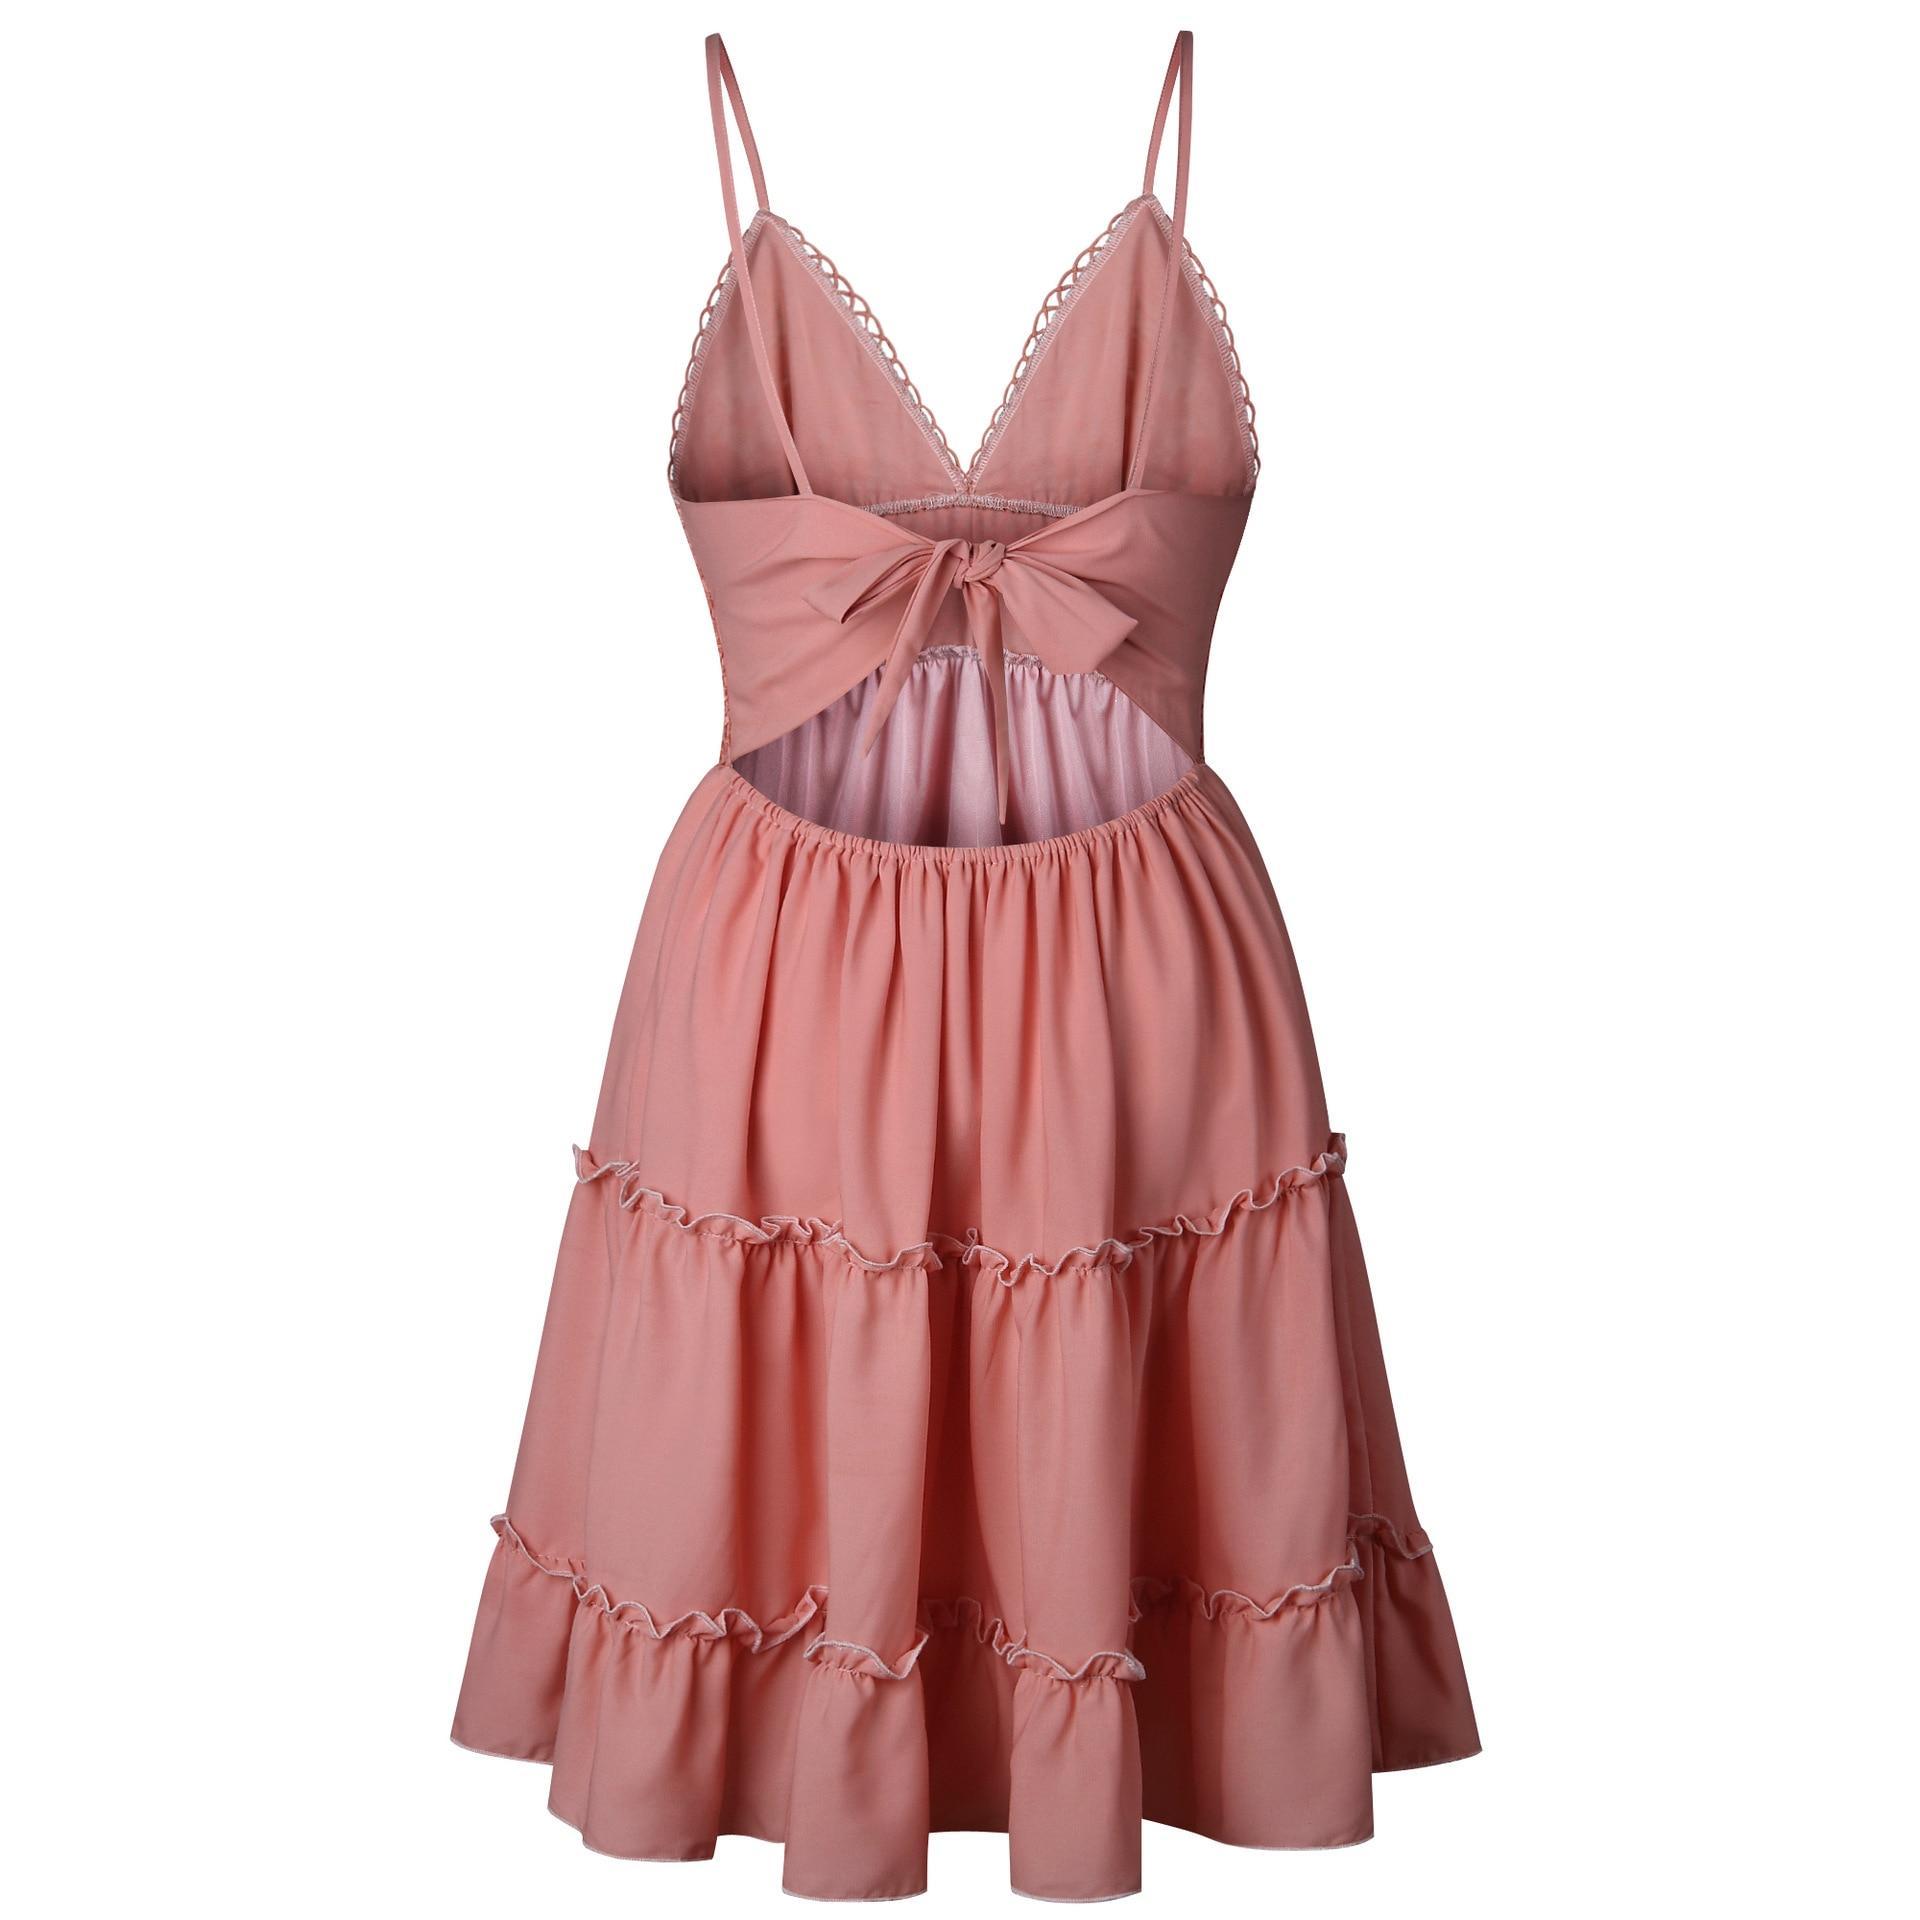 Summer Women White Lace Halter Dress Sexy Backless Beach Dresses 2020 Fashion Sleeveless Spaghetti Strap Casual Mini Sundress 4